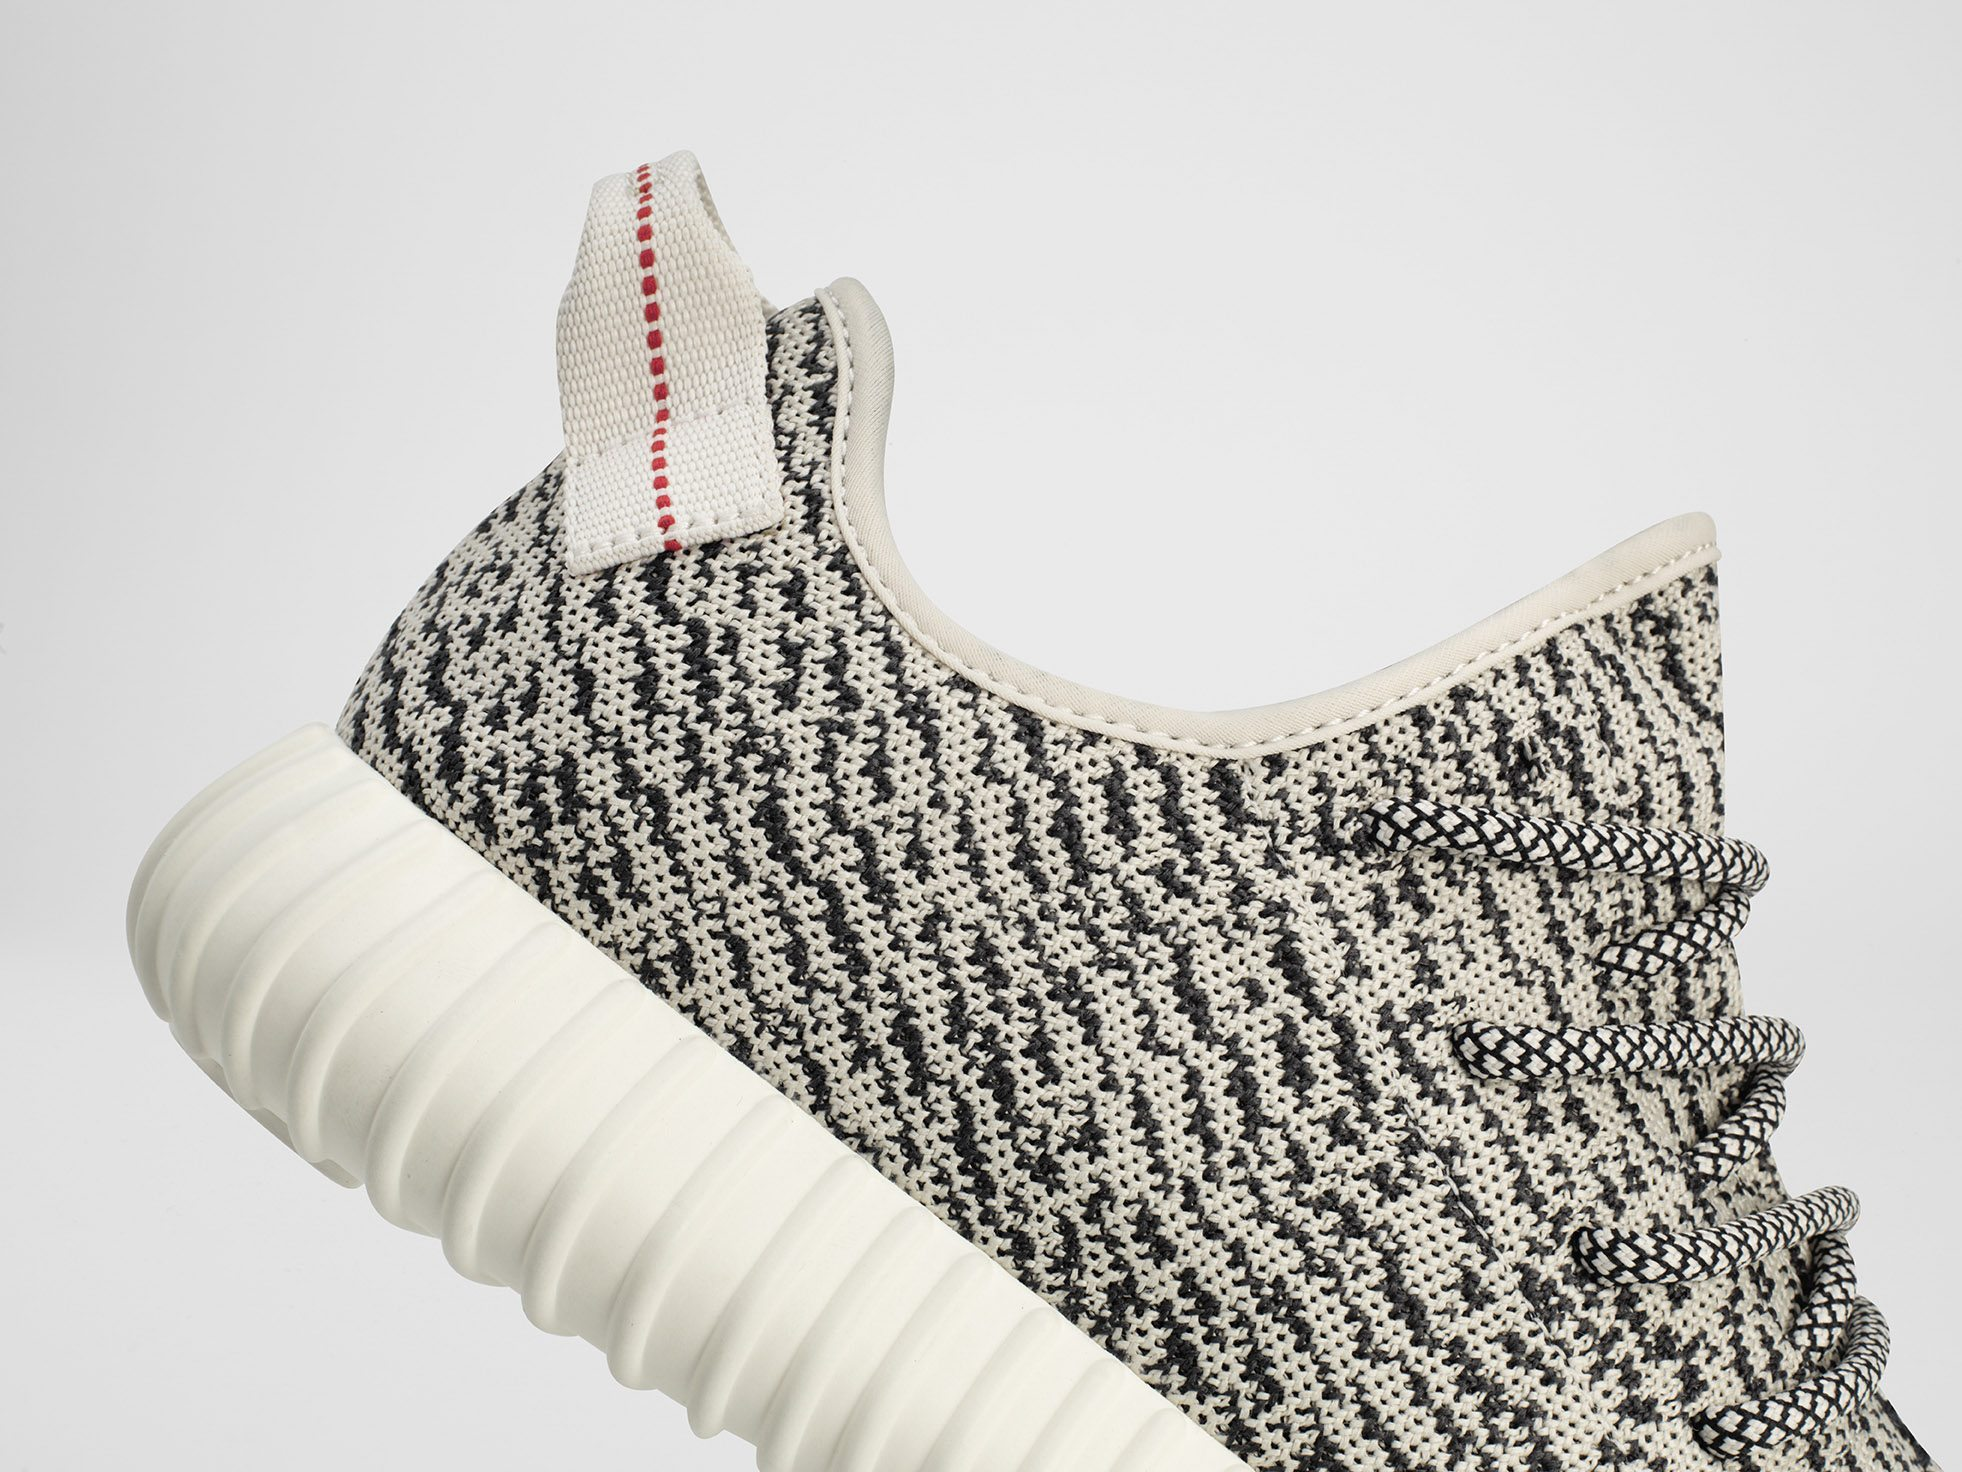 Kanye West x adidas Originals Yeezy Boost 350 8